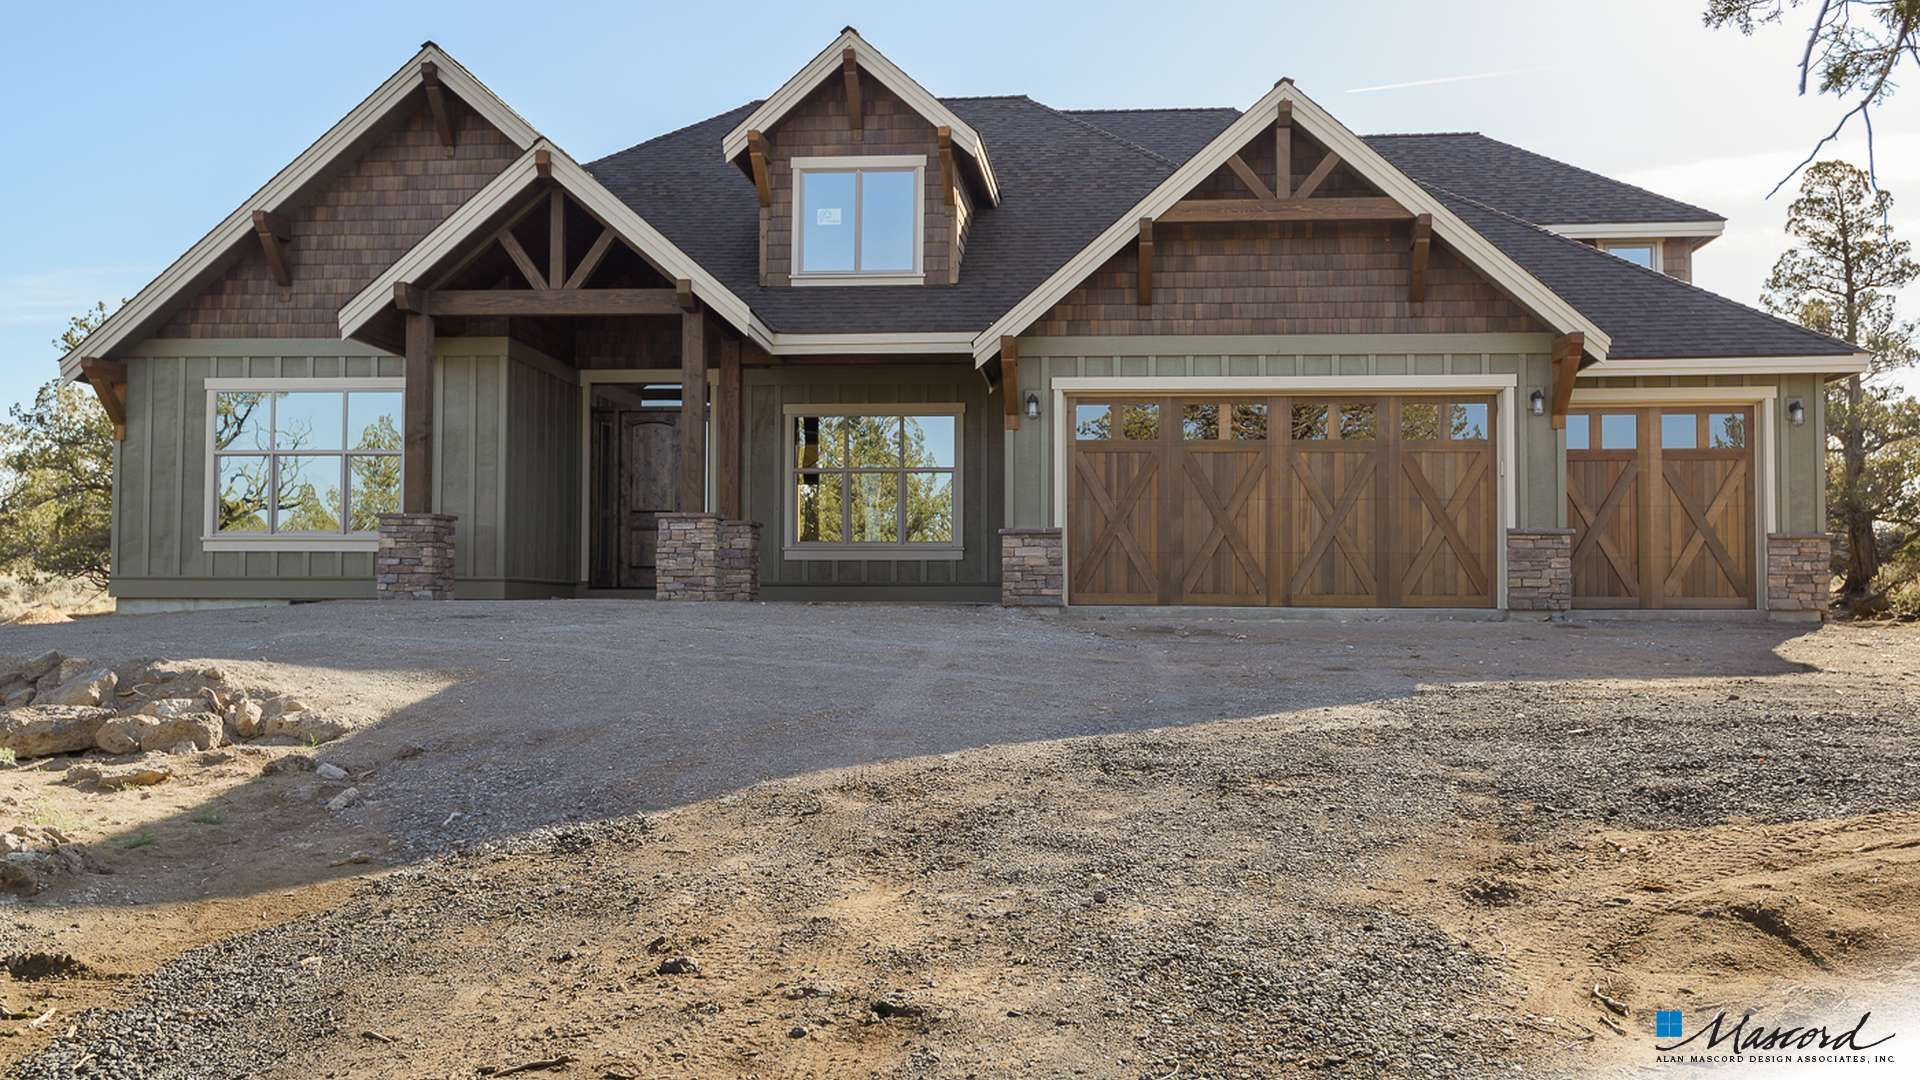 Craftsman House Plan 23111 The Edgefield 3340 Sqft 4